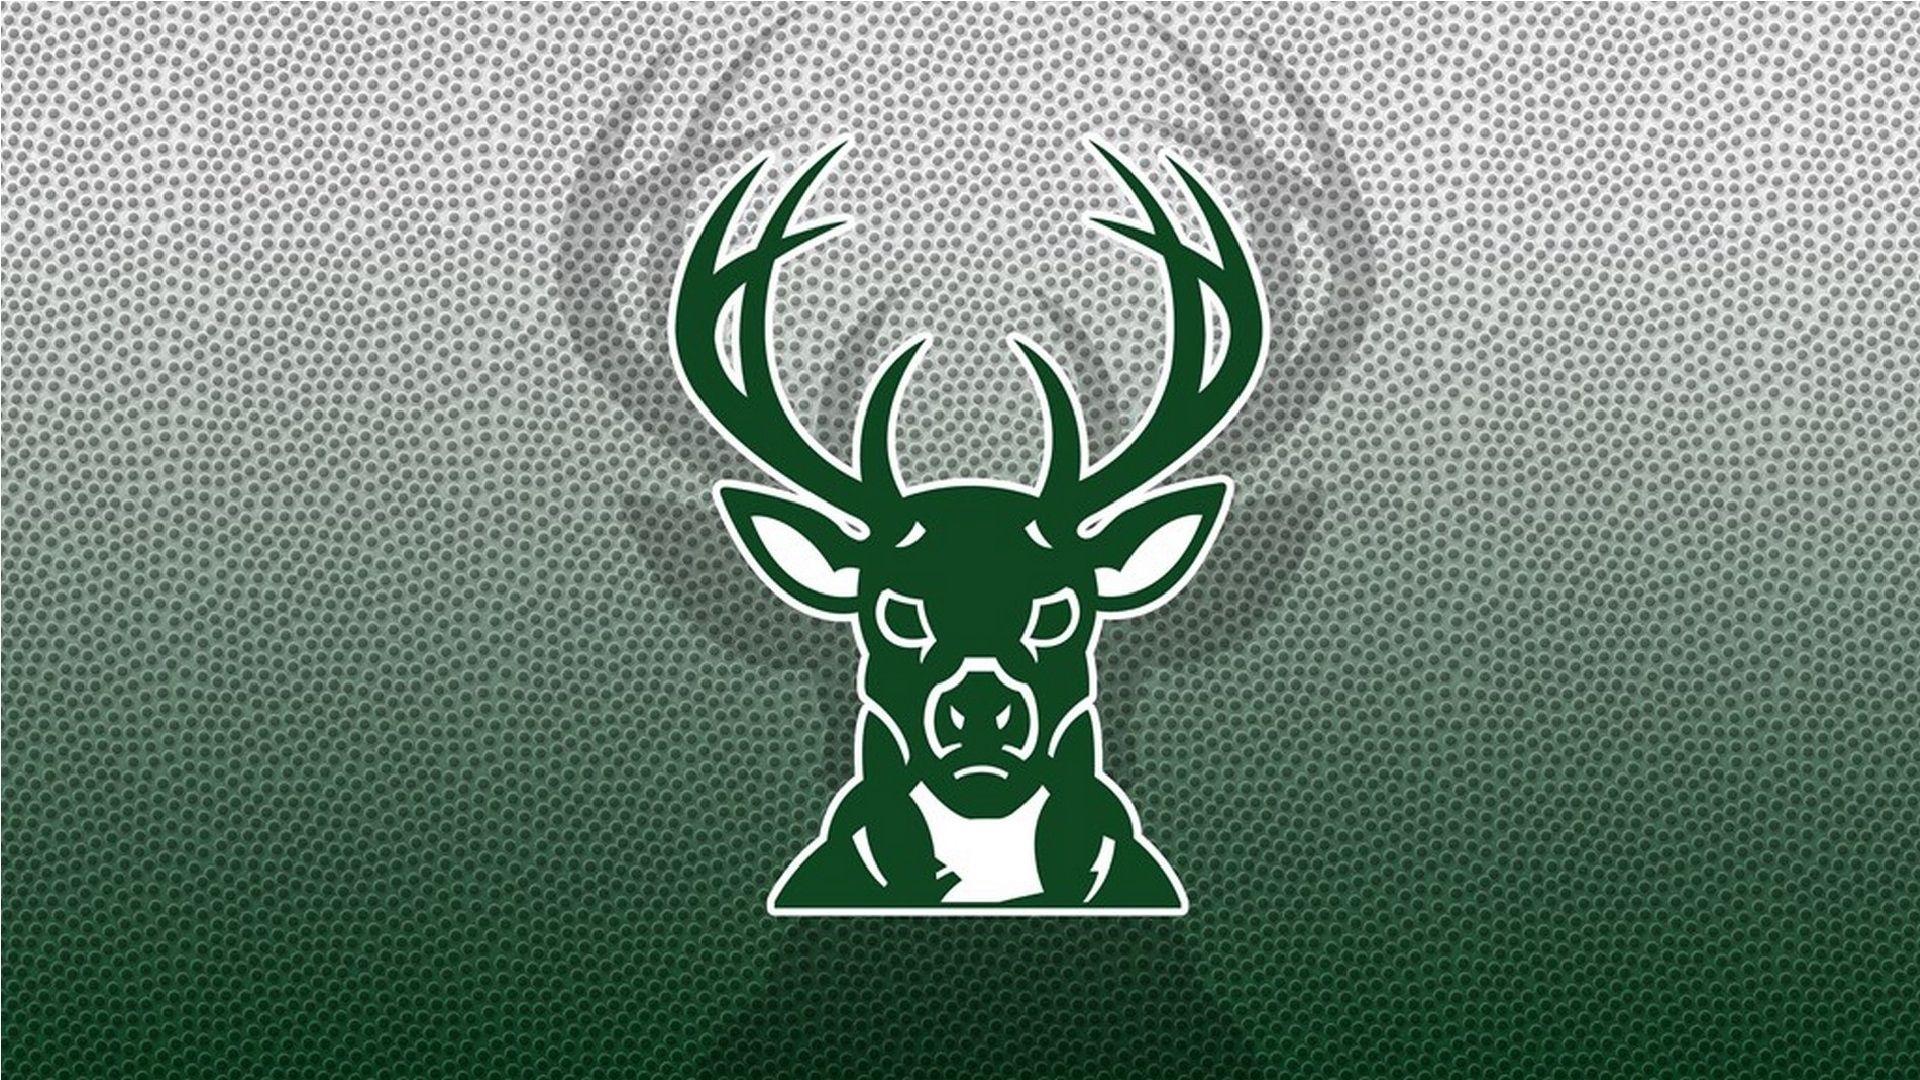 Milwaukee Bucks Wallpaper Hd 2021 Basketball Wallpaper Basketball Wallpaper Basketball Wallpapers Hd Milwaukee Bucks